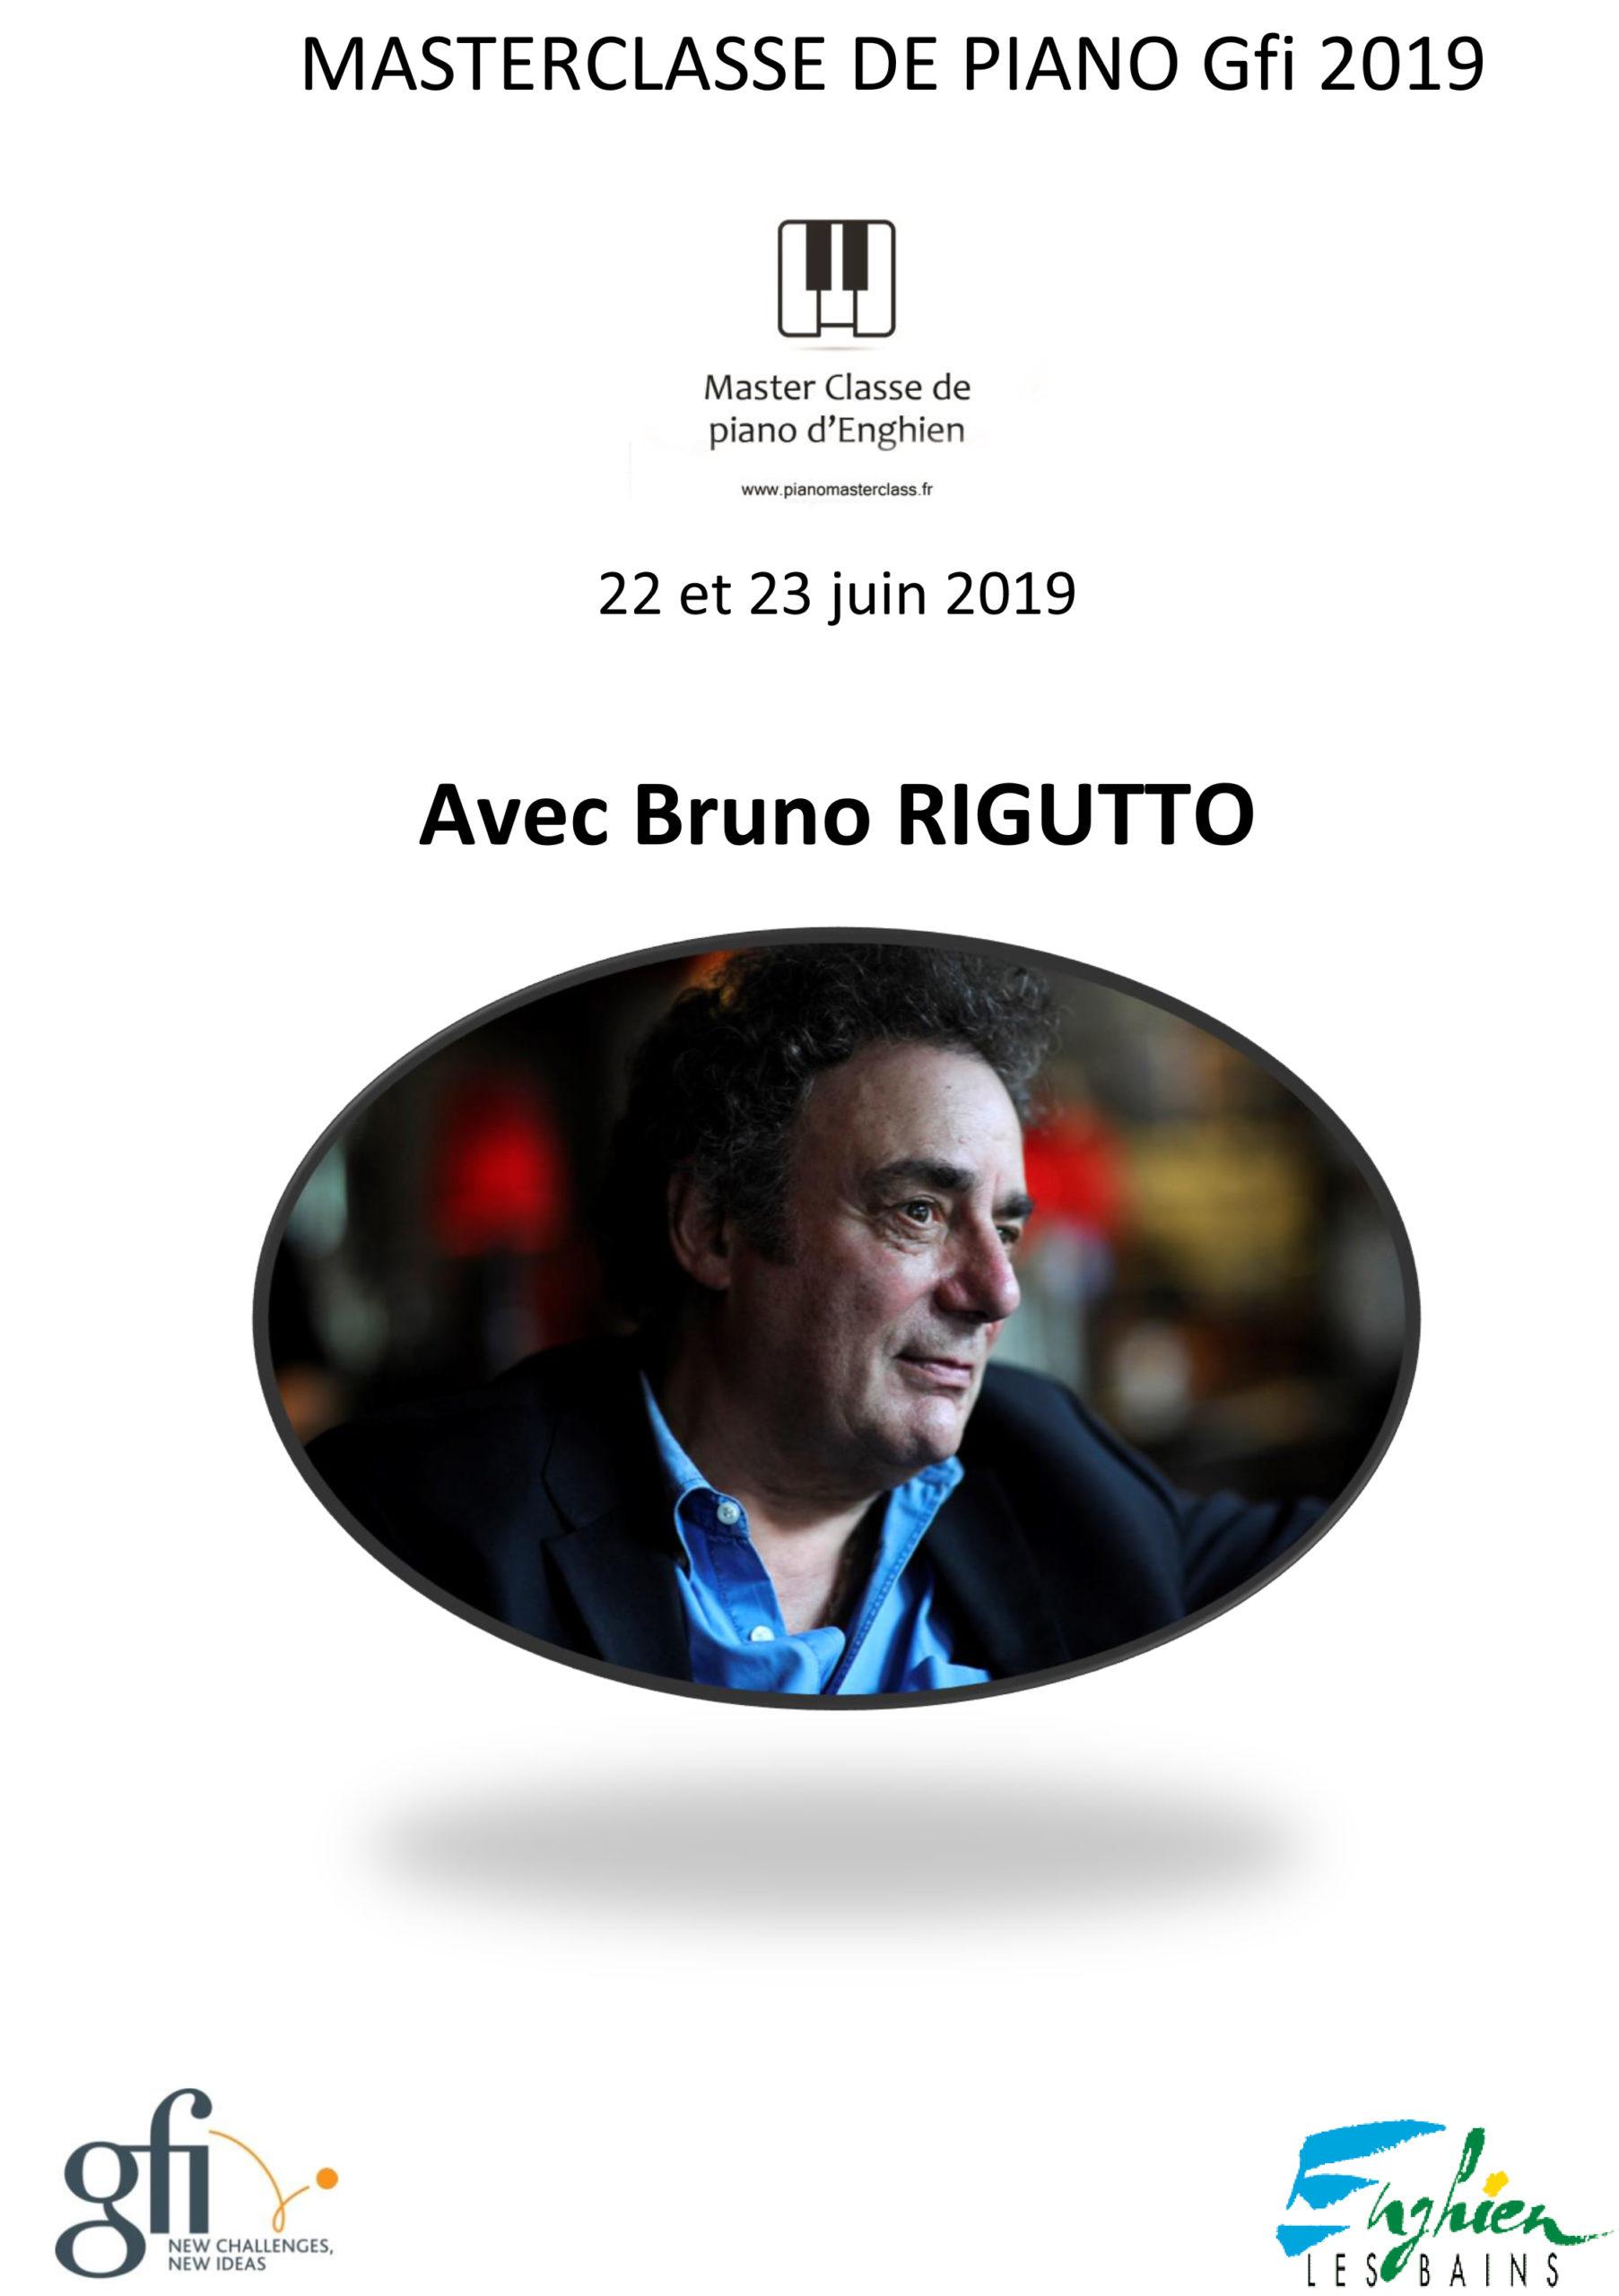 Interview de Bruno Rigutto